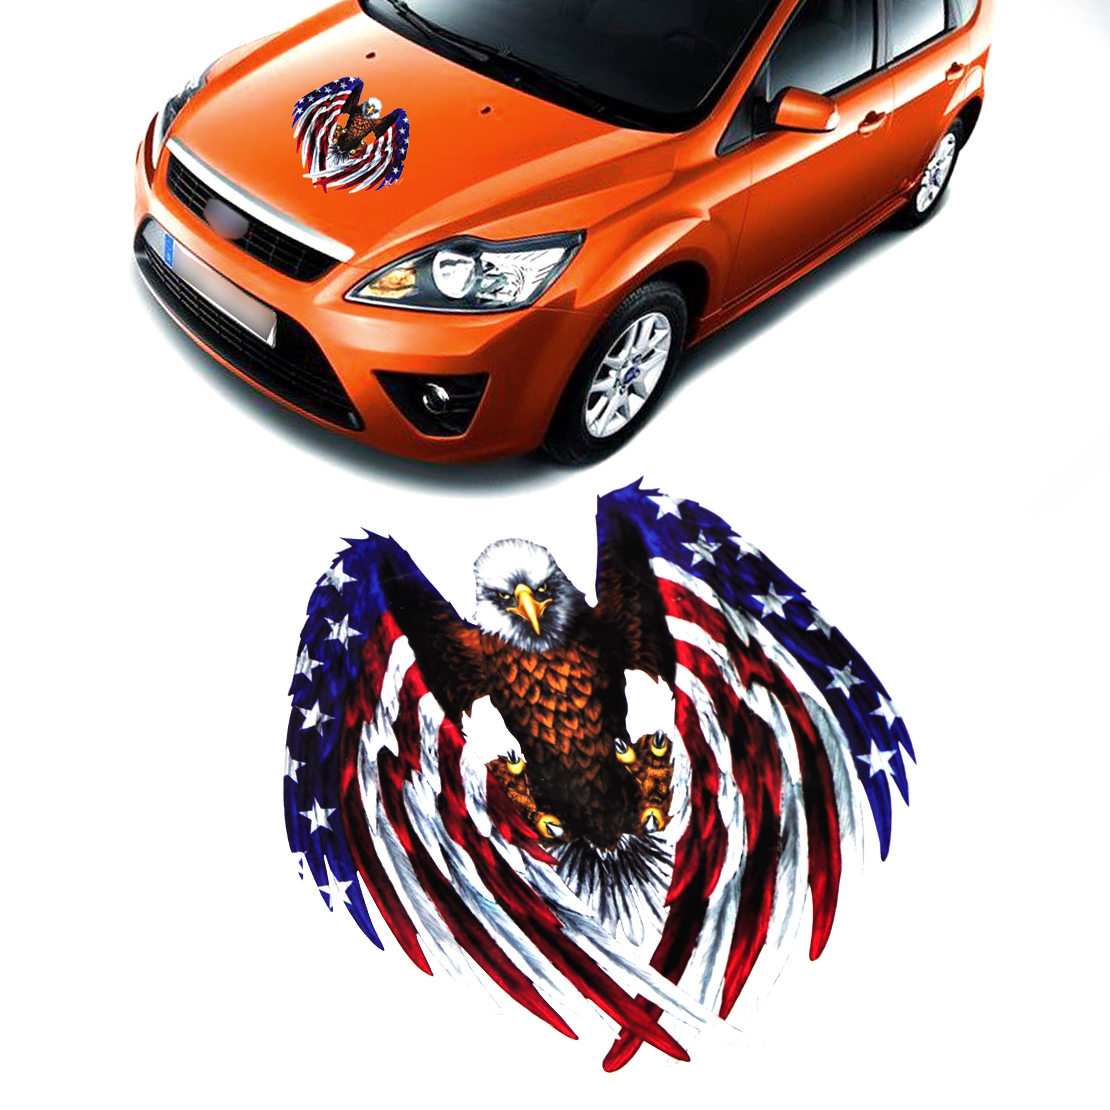 Car sticker eagle - Car Sticker Eagle American United States Usa Flag Sticker Decal Car Bumper Bike Laptop Window For